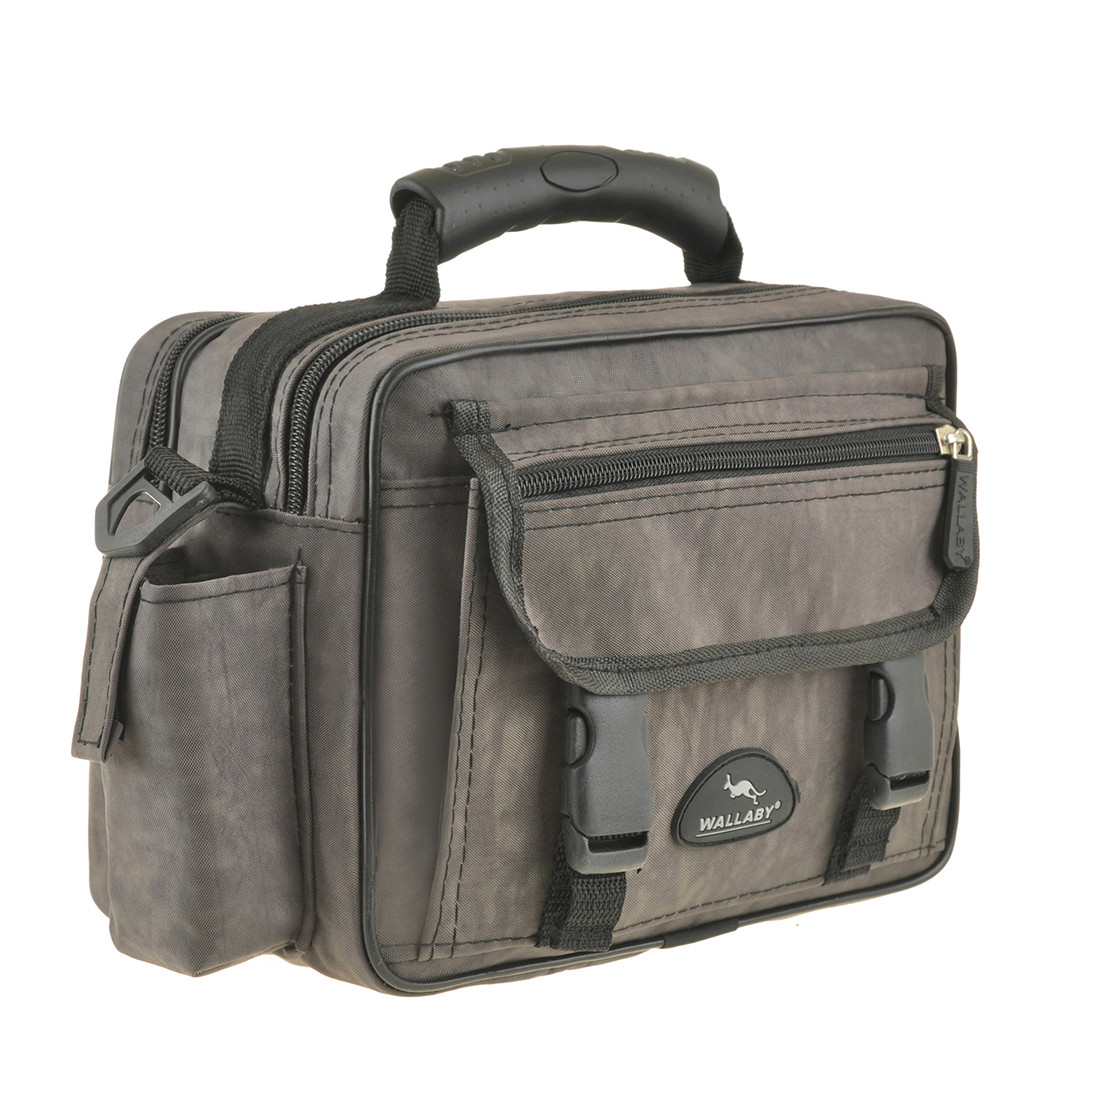 Мужская сумка Wallaby 25х18х13 ткань «Кордура» горизонтальная цвет хаки,  в2427х